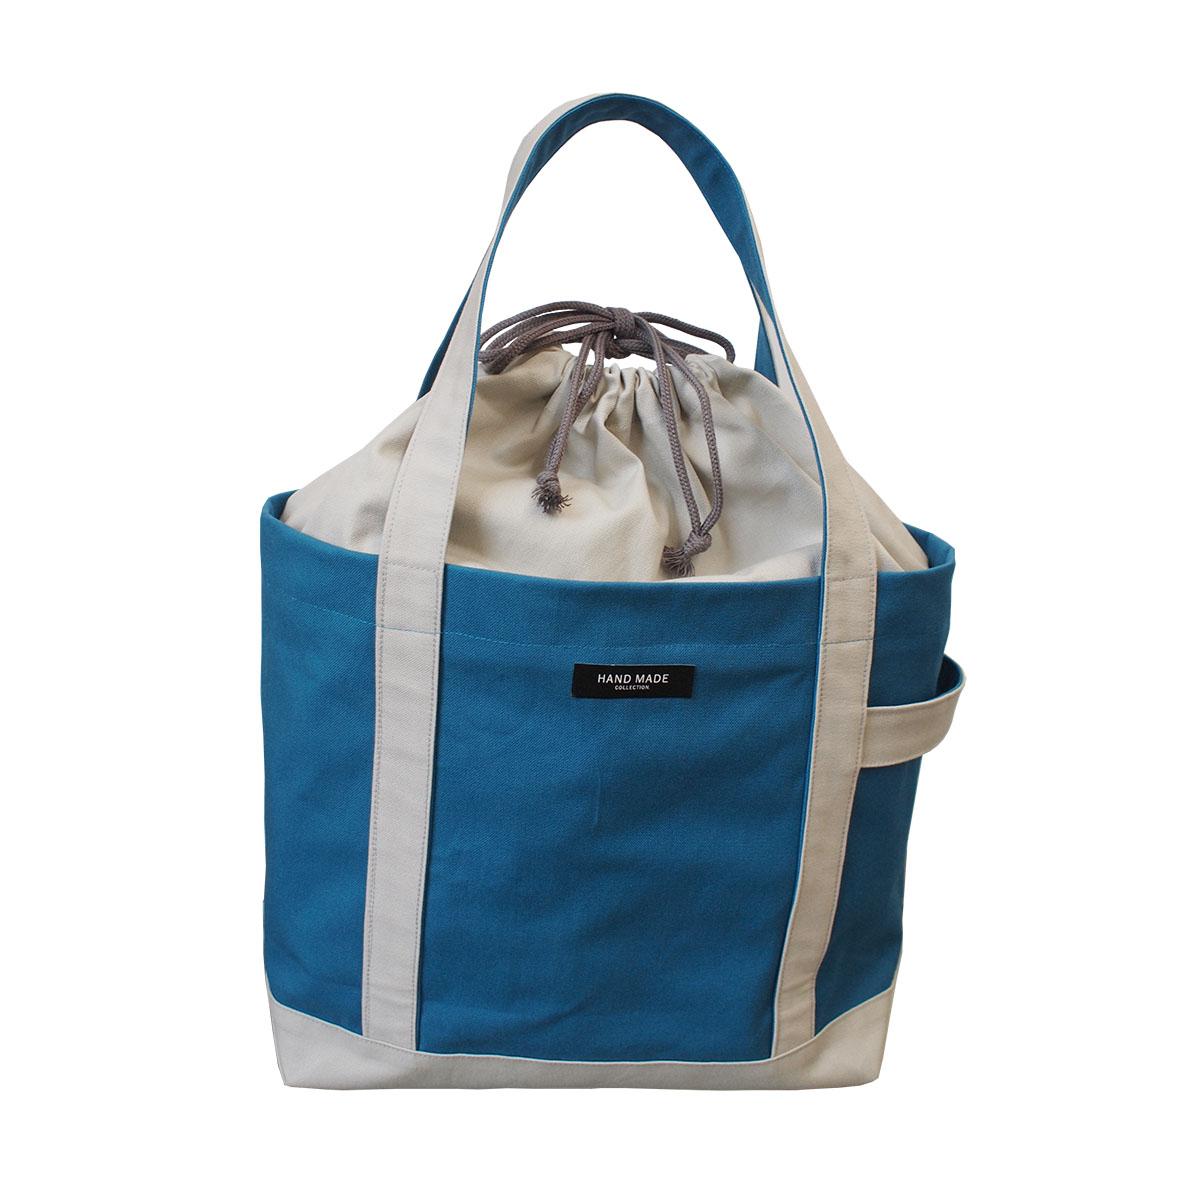 patron de sac tote bag 3b com. Black Bedroom Furniture Sets. Home Design Ideas